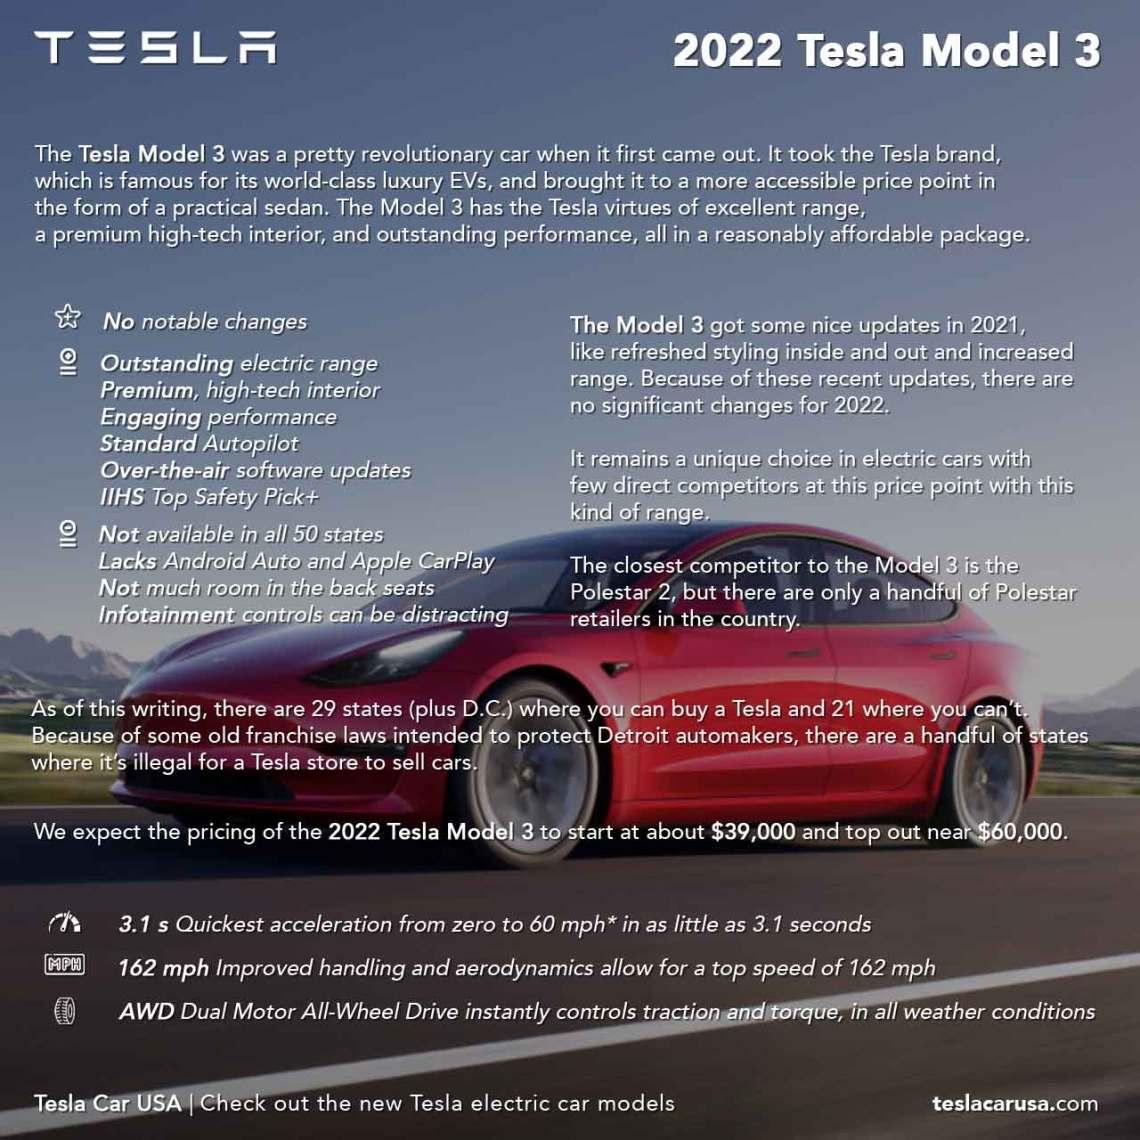 2022 Tesla Model 3